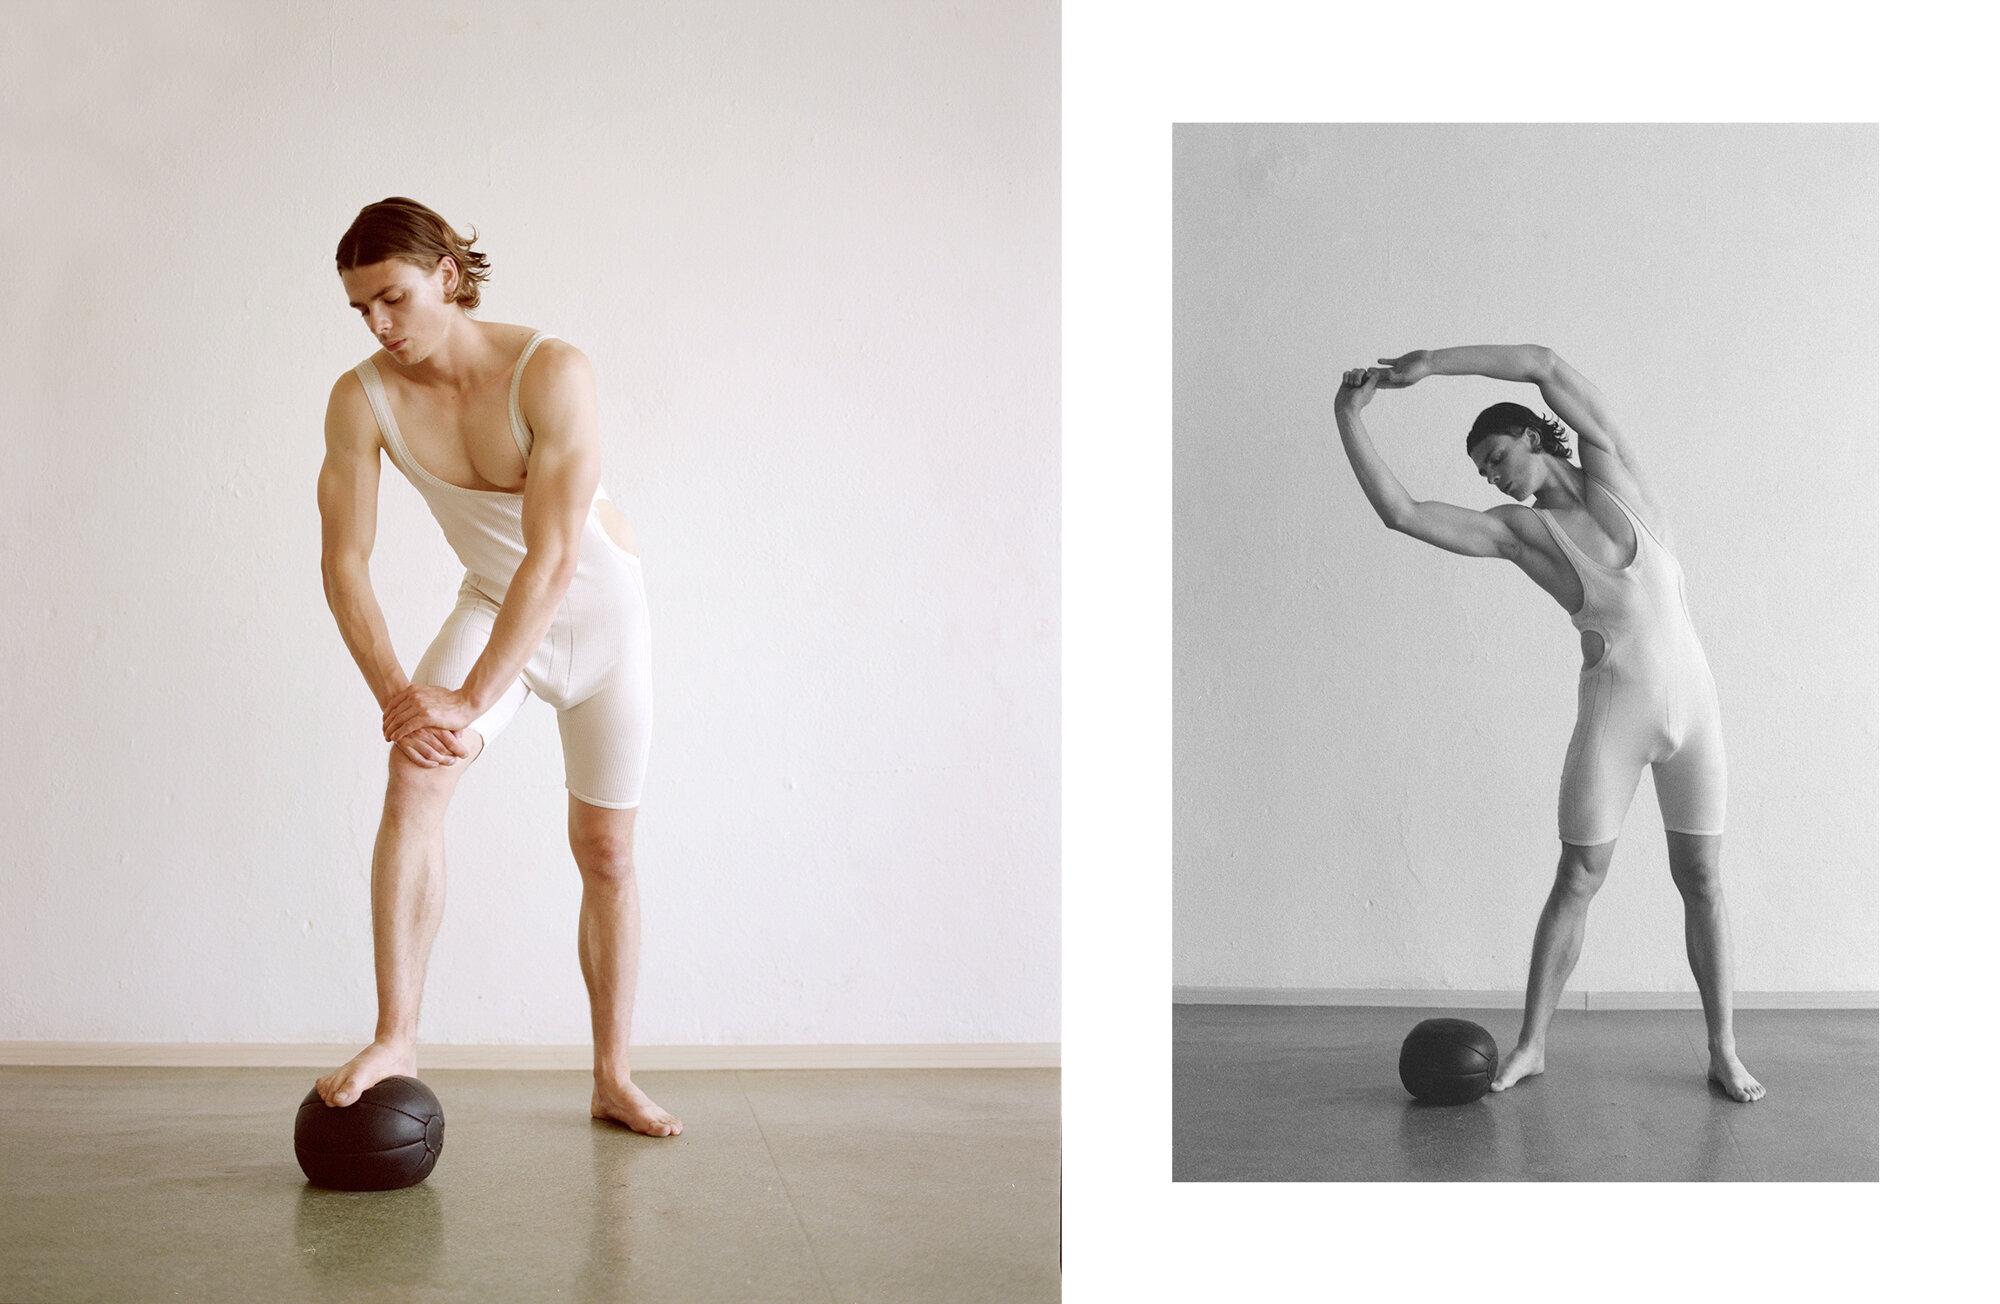 gymboys02.jpg